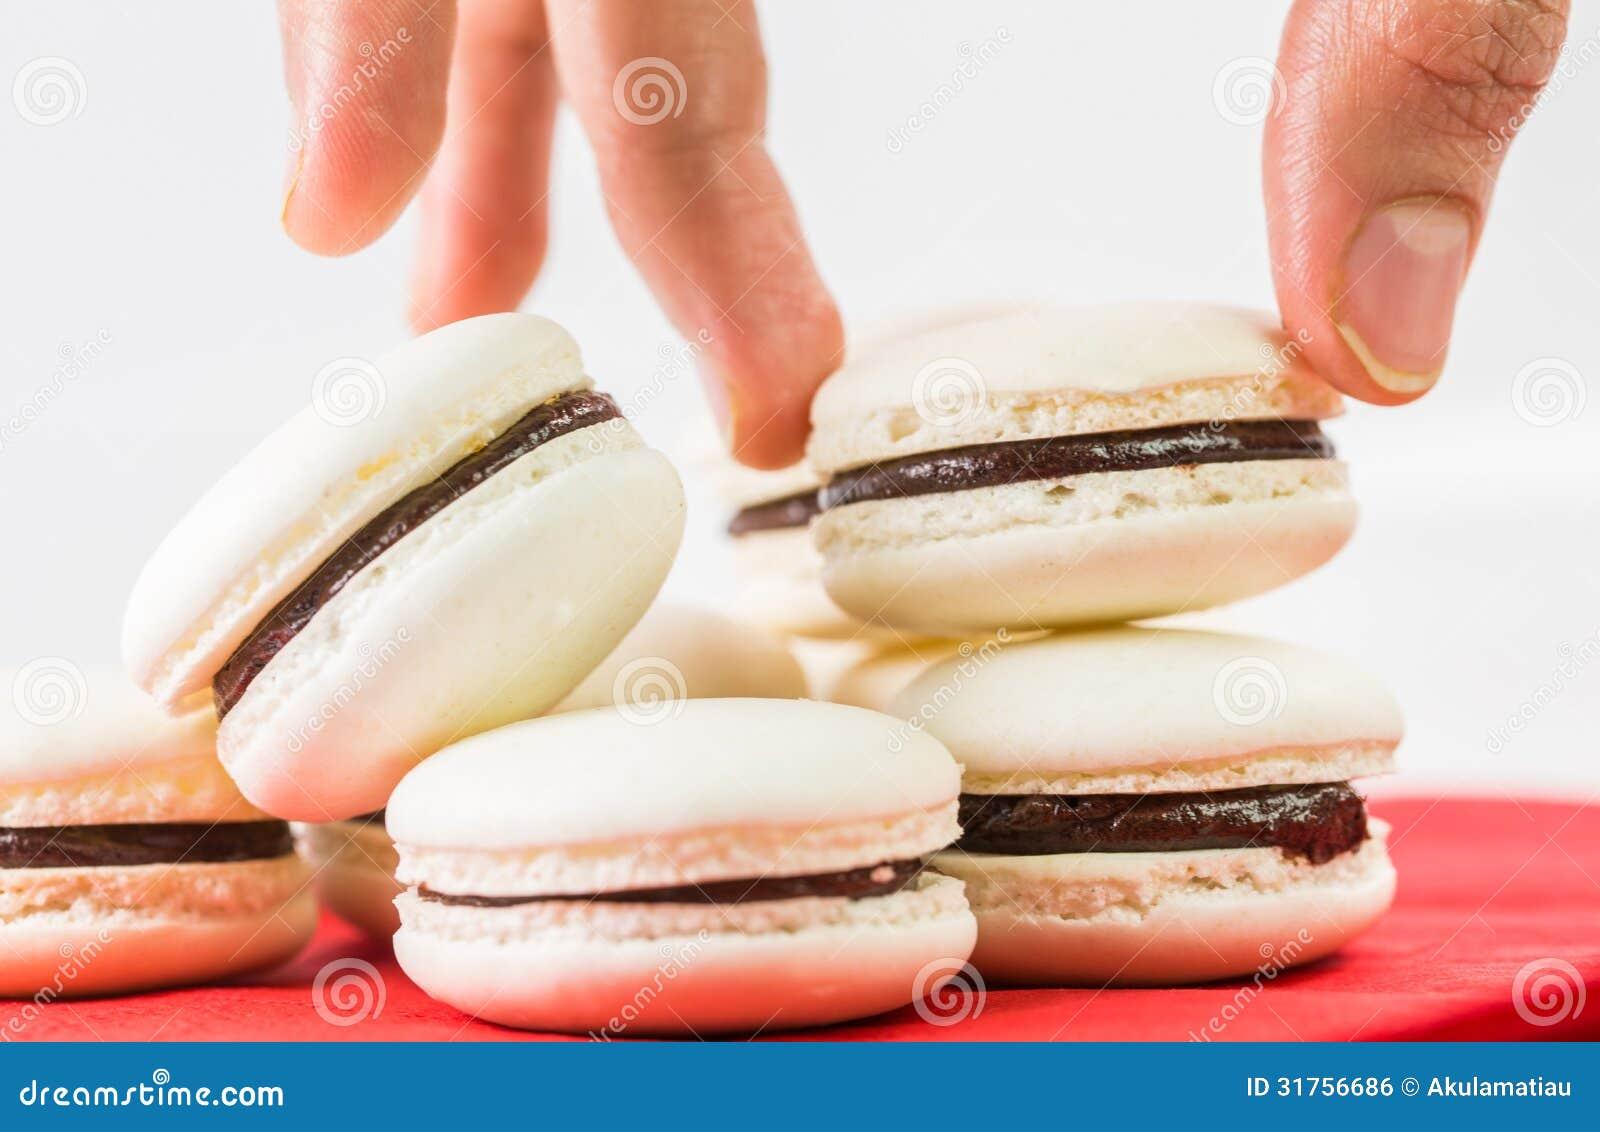 Vanilla Flavored French Macarons V Royalty Free Stock Image - Image ...